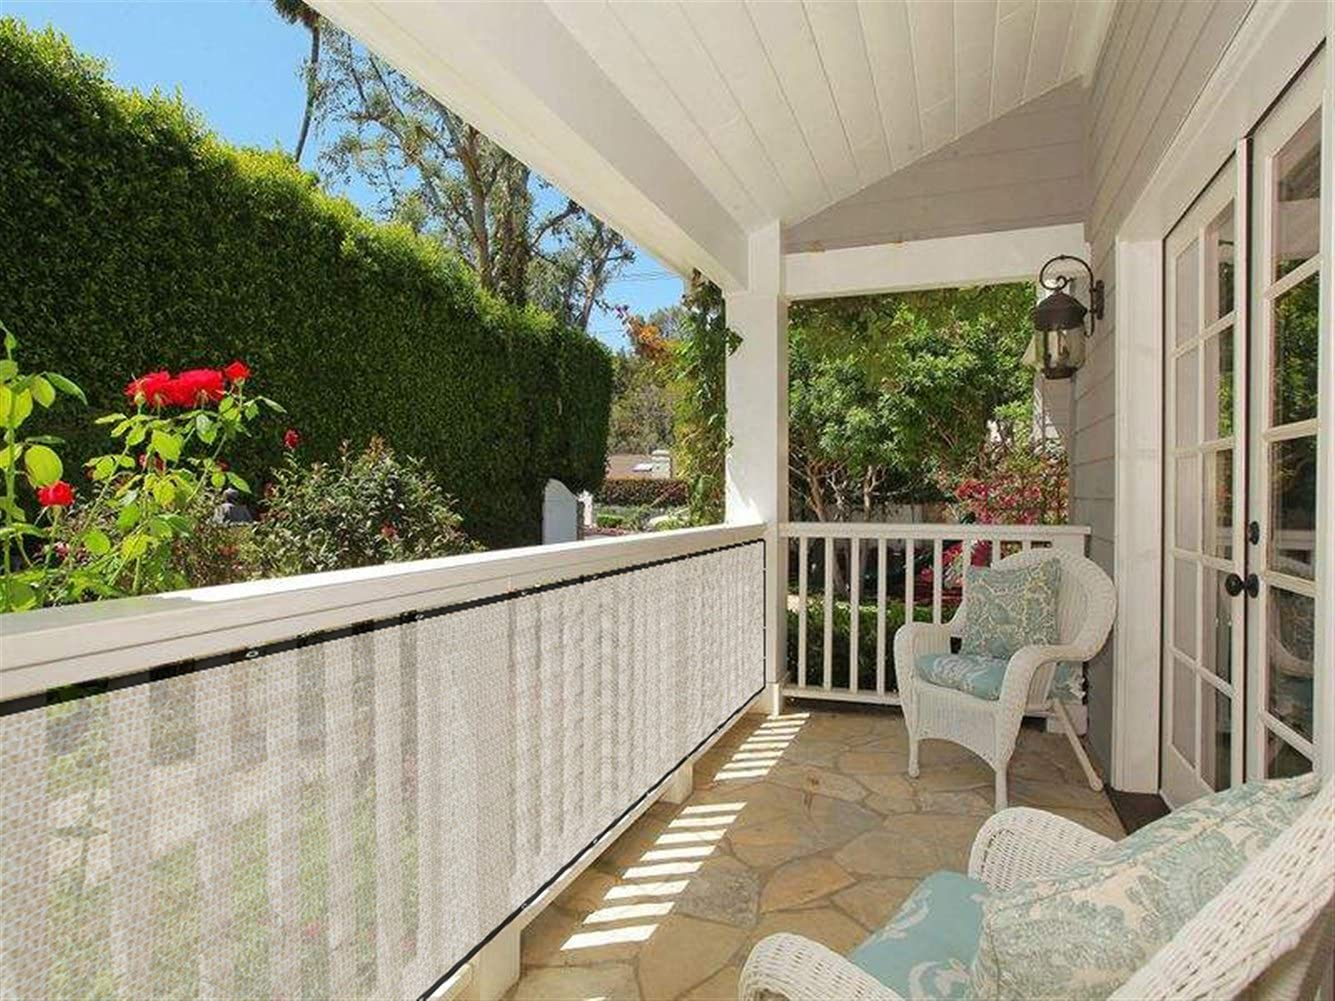 Liveinu Privacy Fence Screen Windscreen for Balcony Porch Verandah Deck Terrace Patio Backyard Railing Balcony Privacy Screen Cover for UV Protection 2.6'x13' ft Yellow